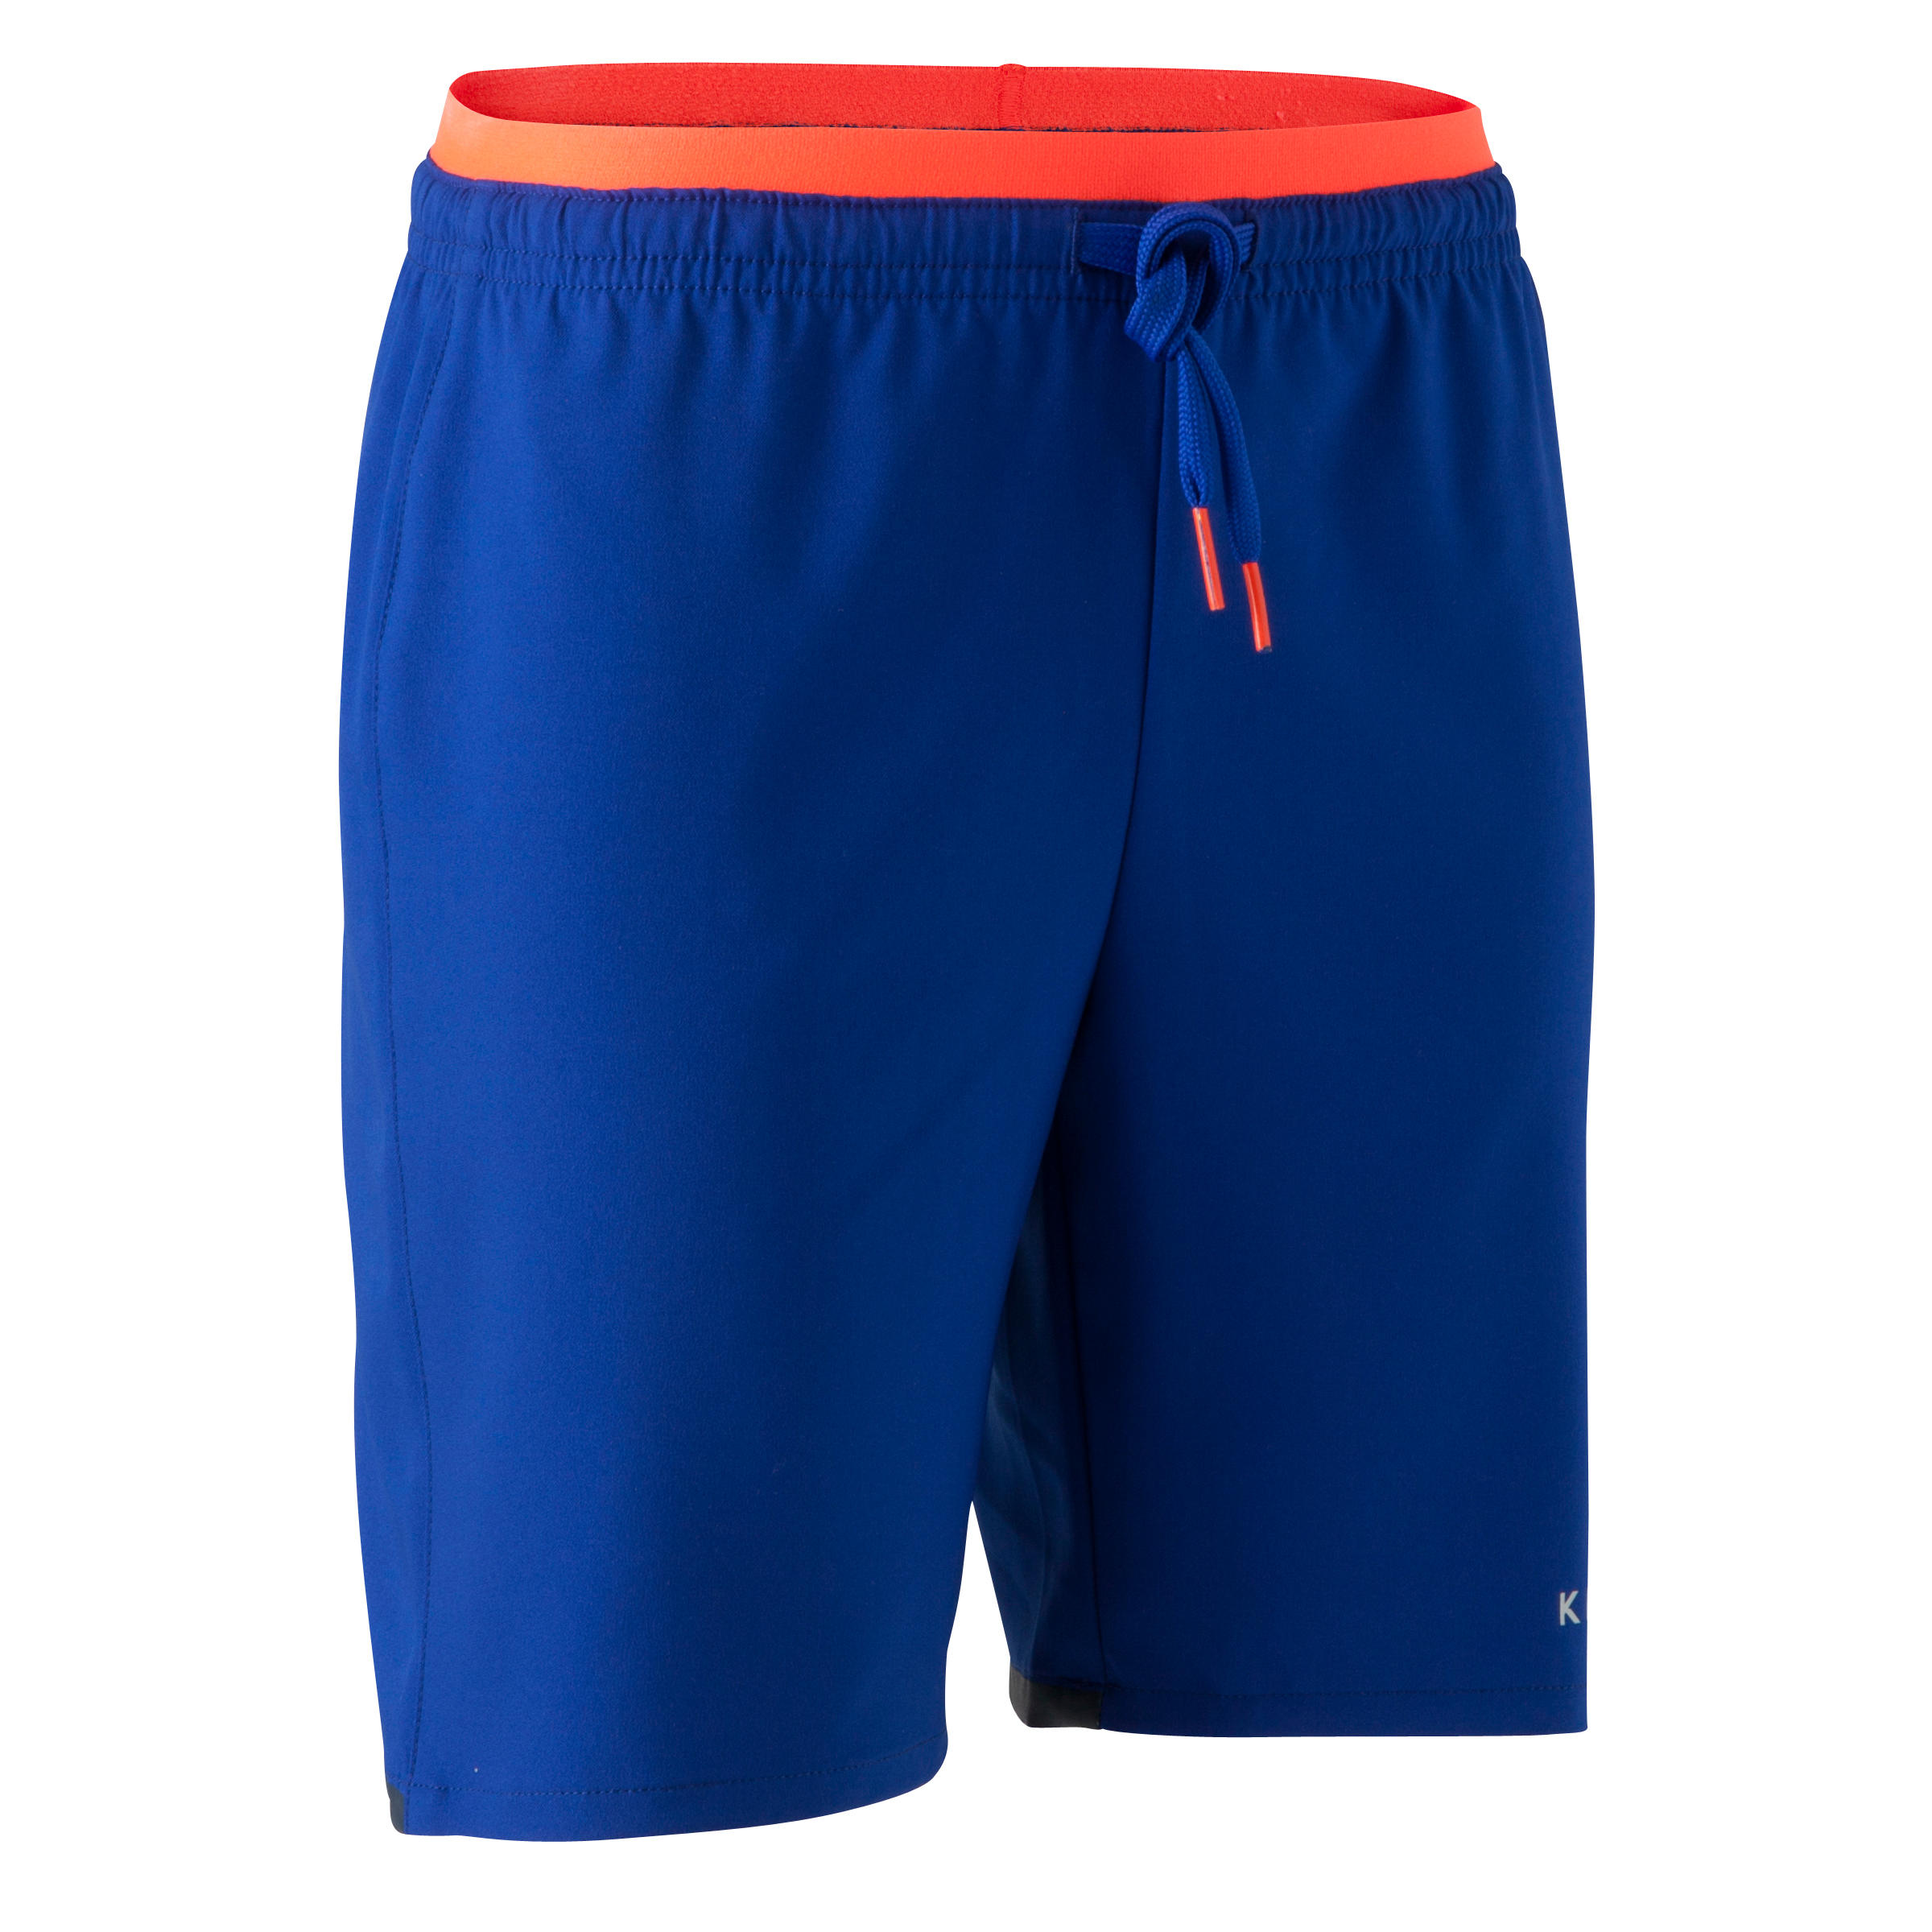 F500 Kids' Football Shorts - Blue/Orange